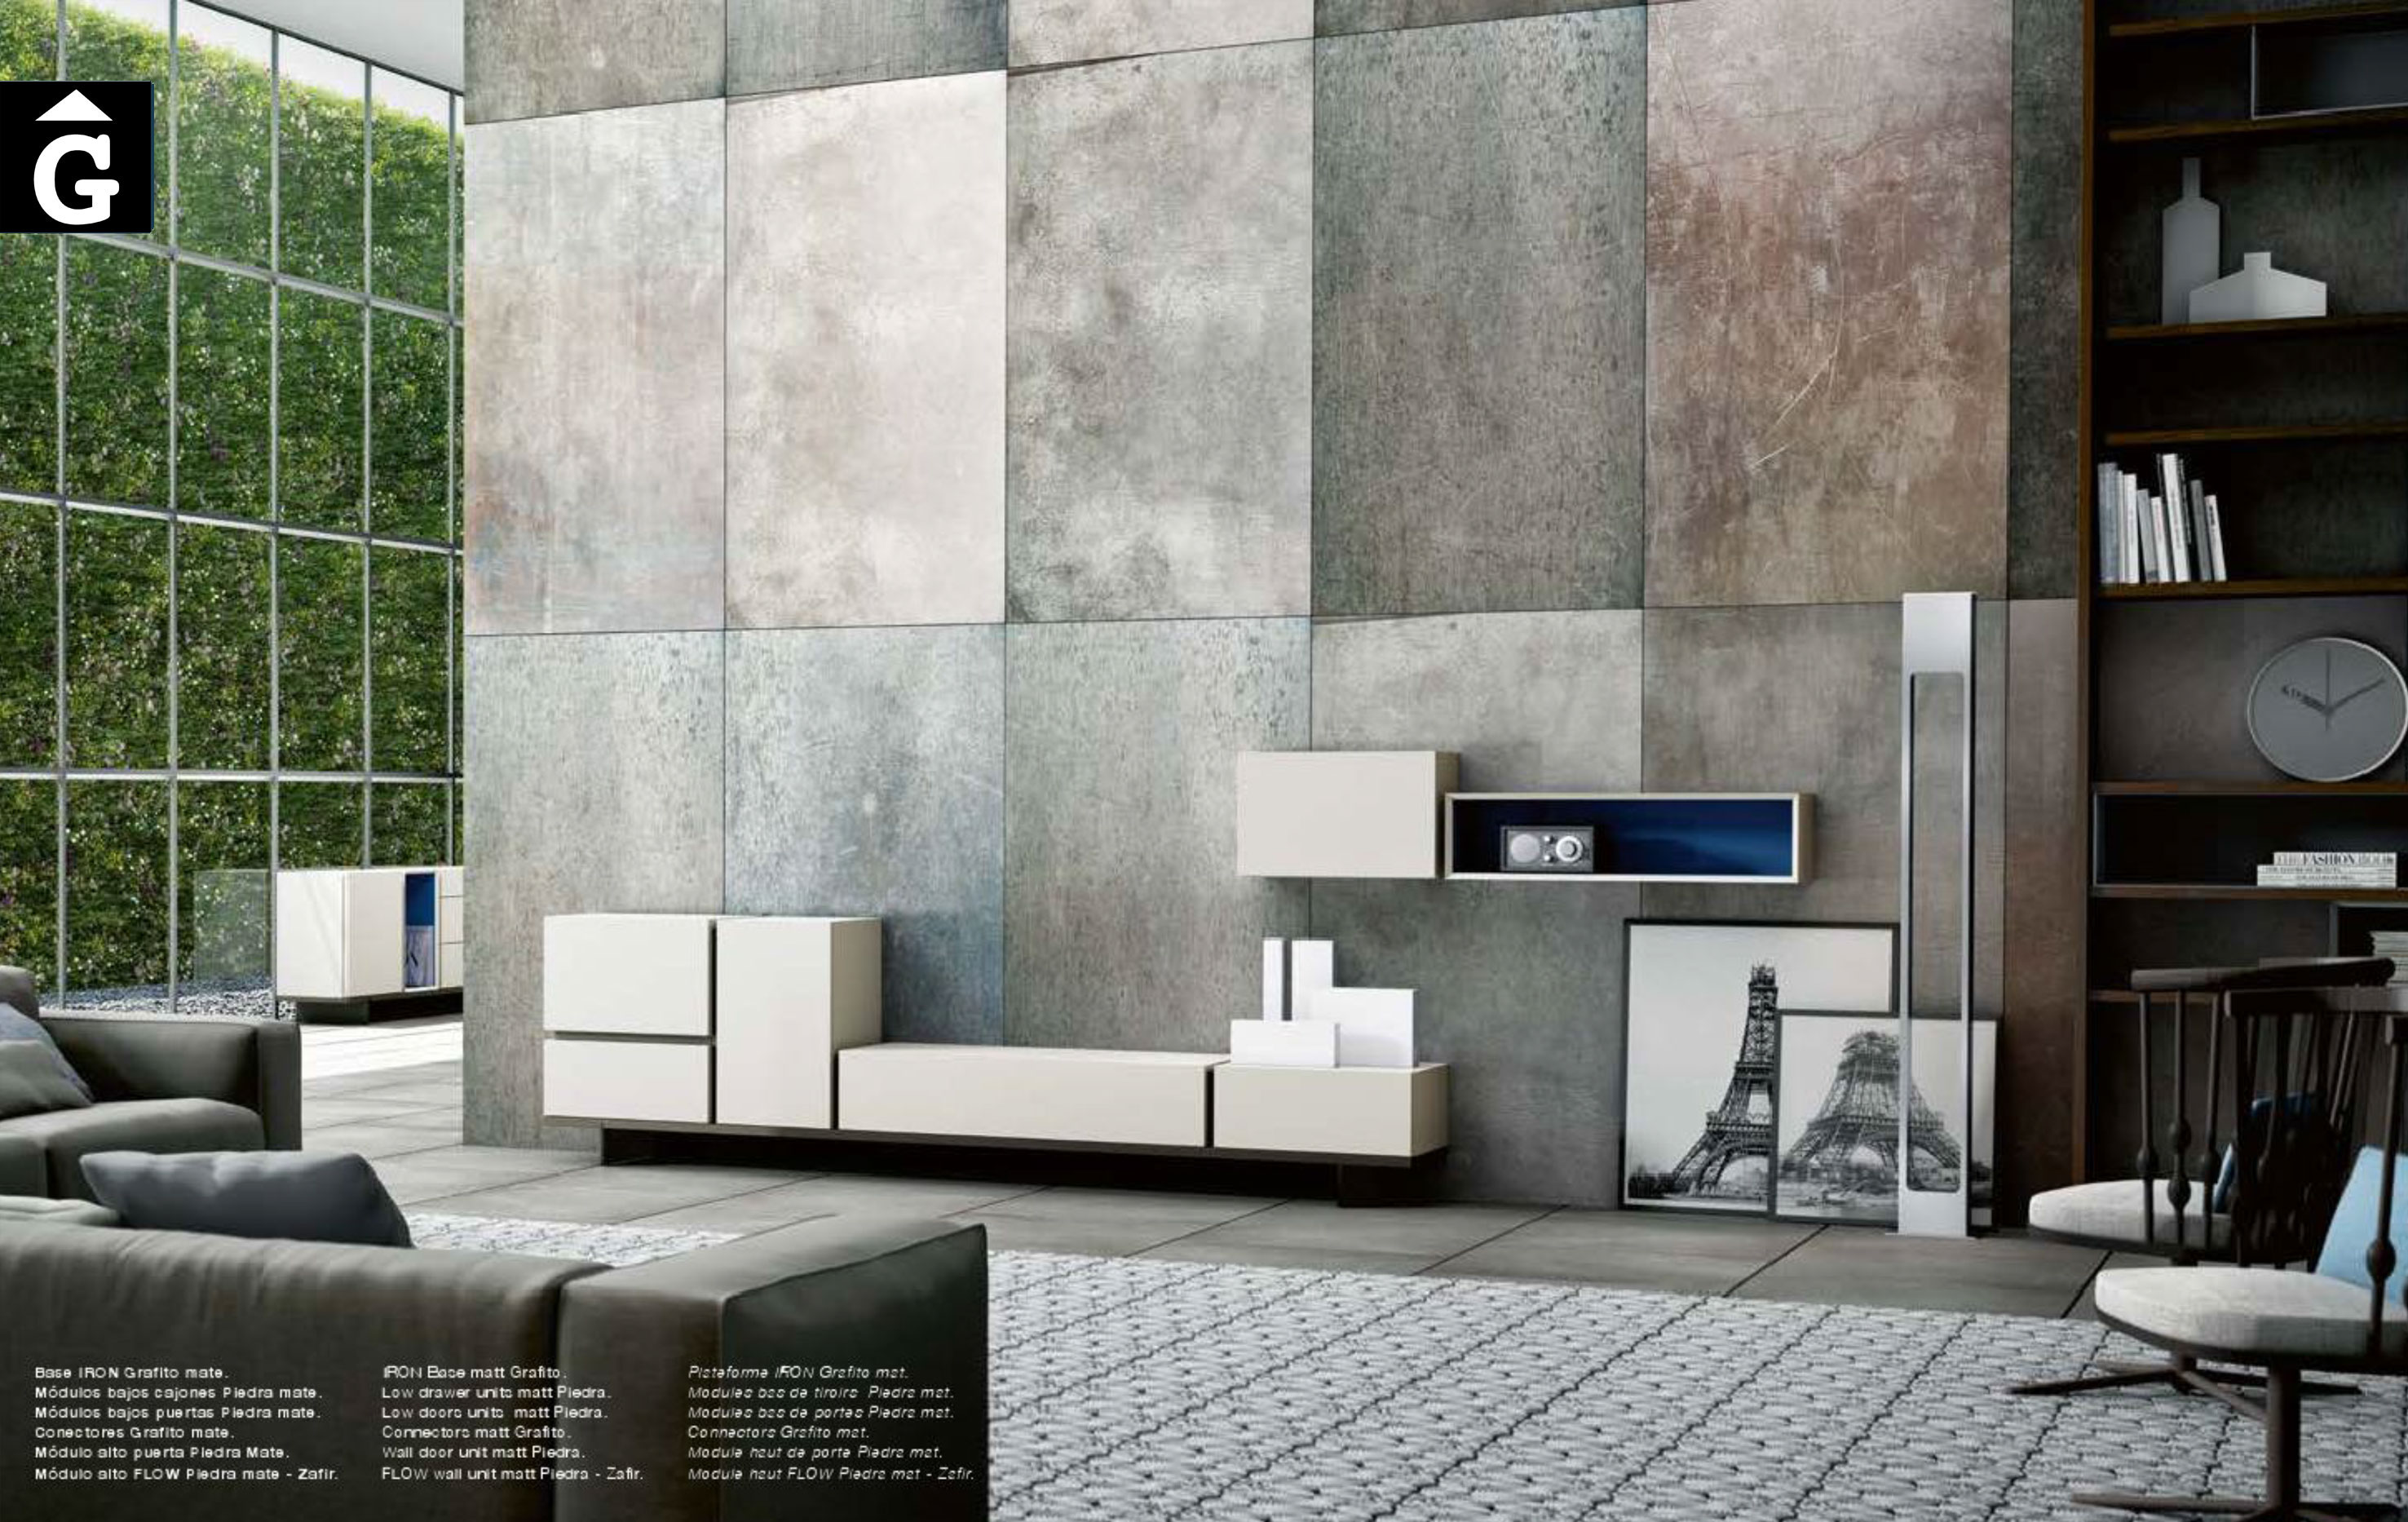 MOBLE-27-CONNECTOR-EMEDE-mobles-by-Mobles-GIFREU-Girona-ESPAI-EMEDE-Epacio-emede-Muebles-MD-moble-menjador-Sala-estar-habitatge-qualitat-laca-xapa-natural